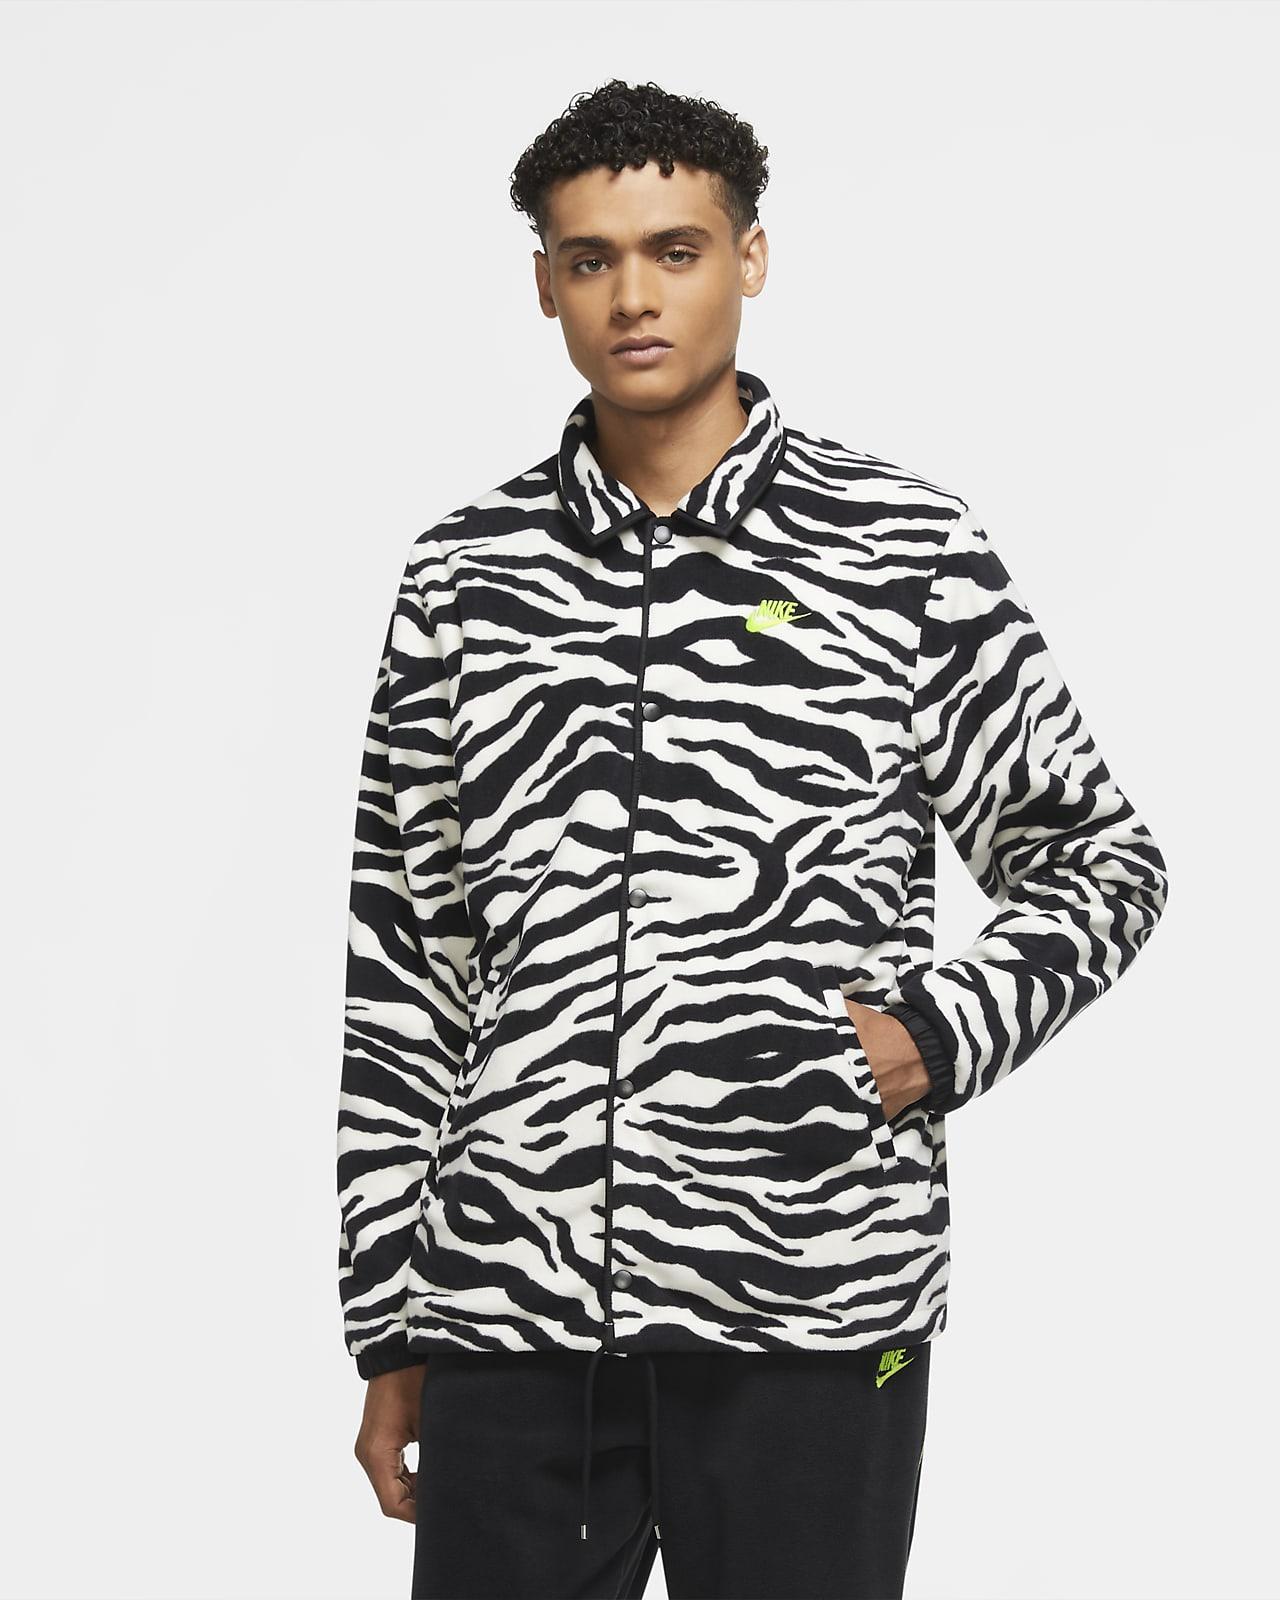 Nike Sportswear City Edition Jaqueta d'entrenador - Home